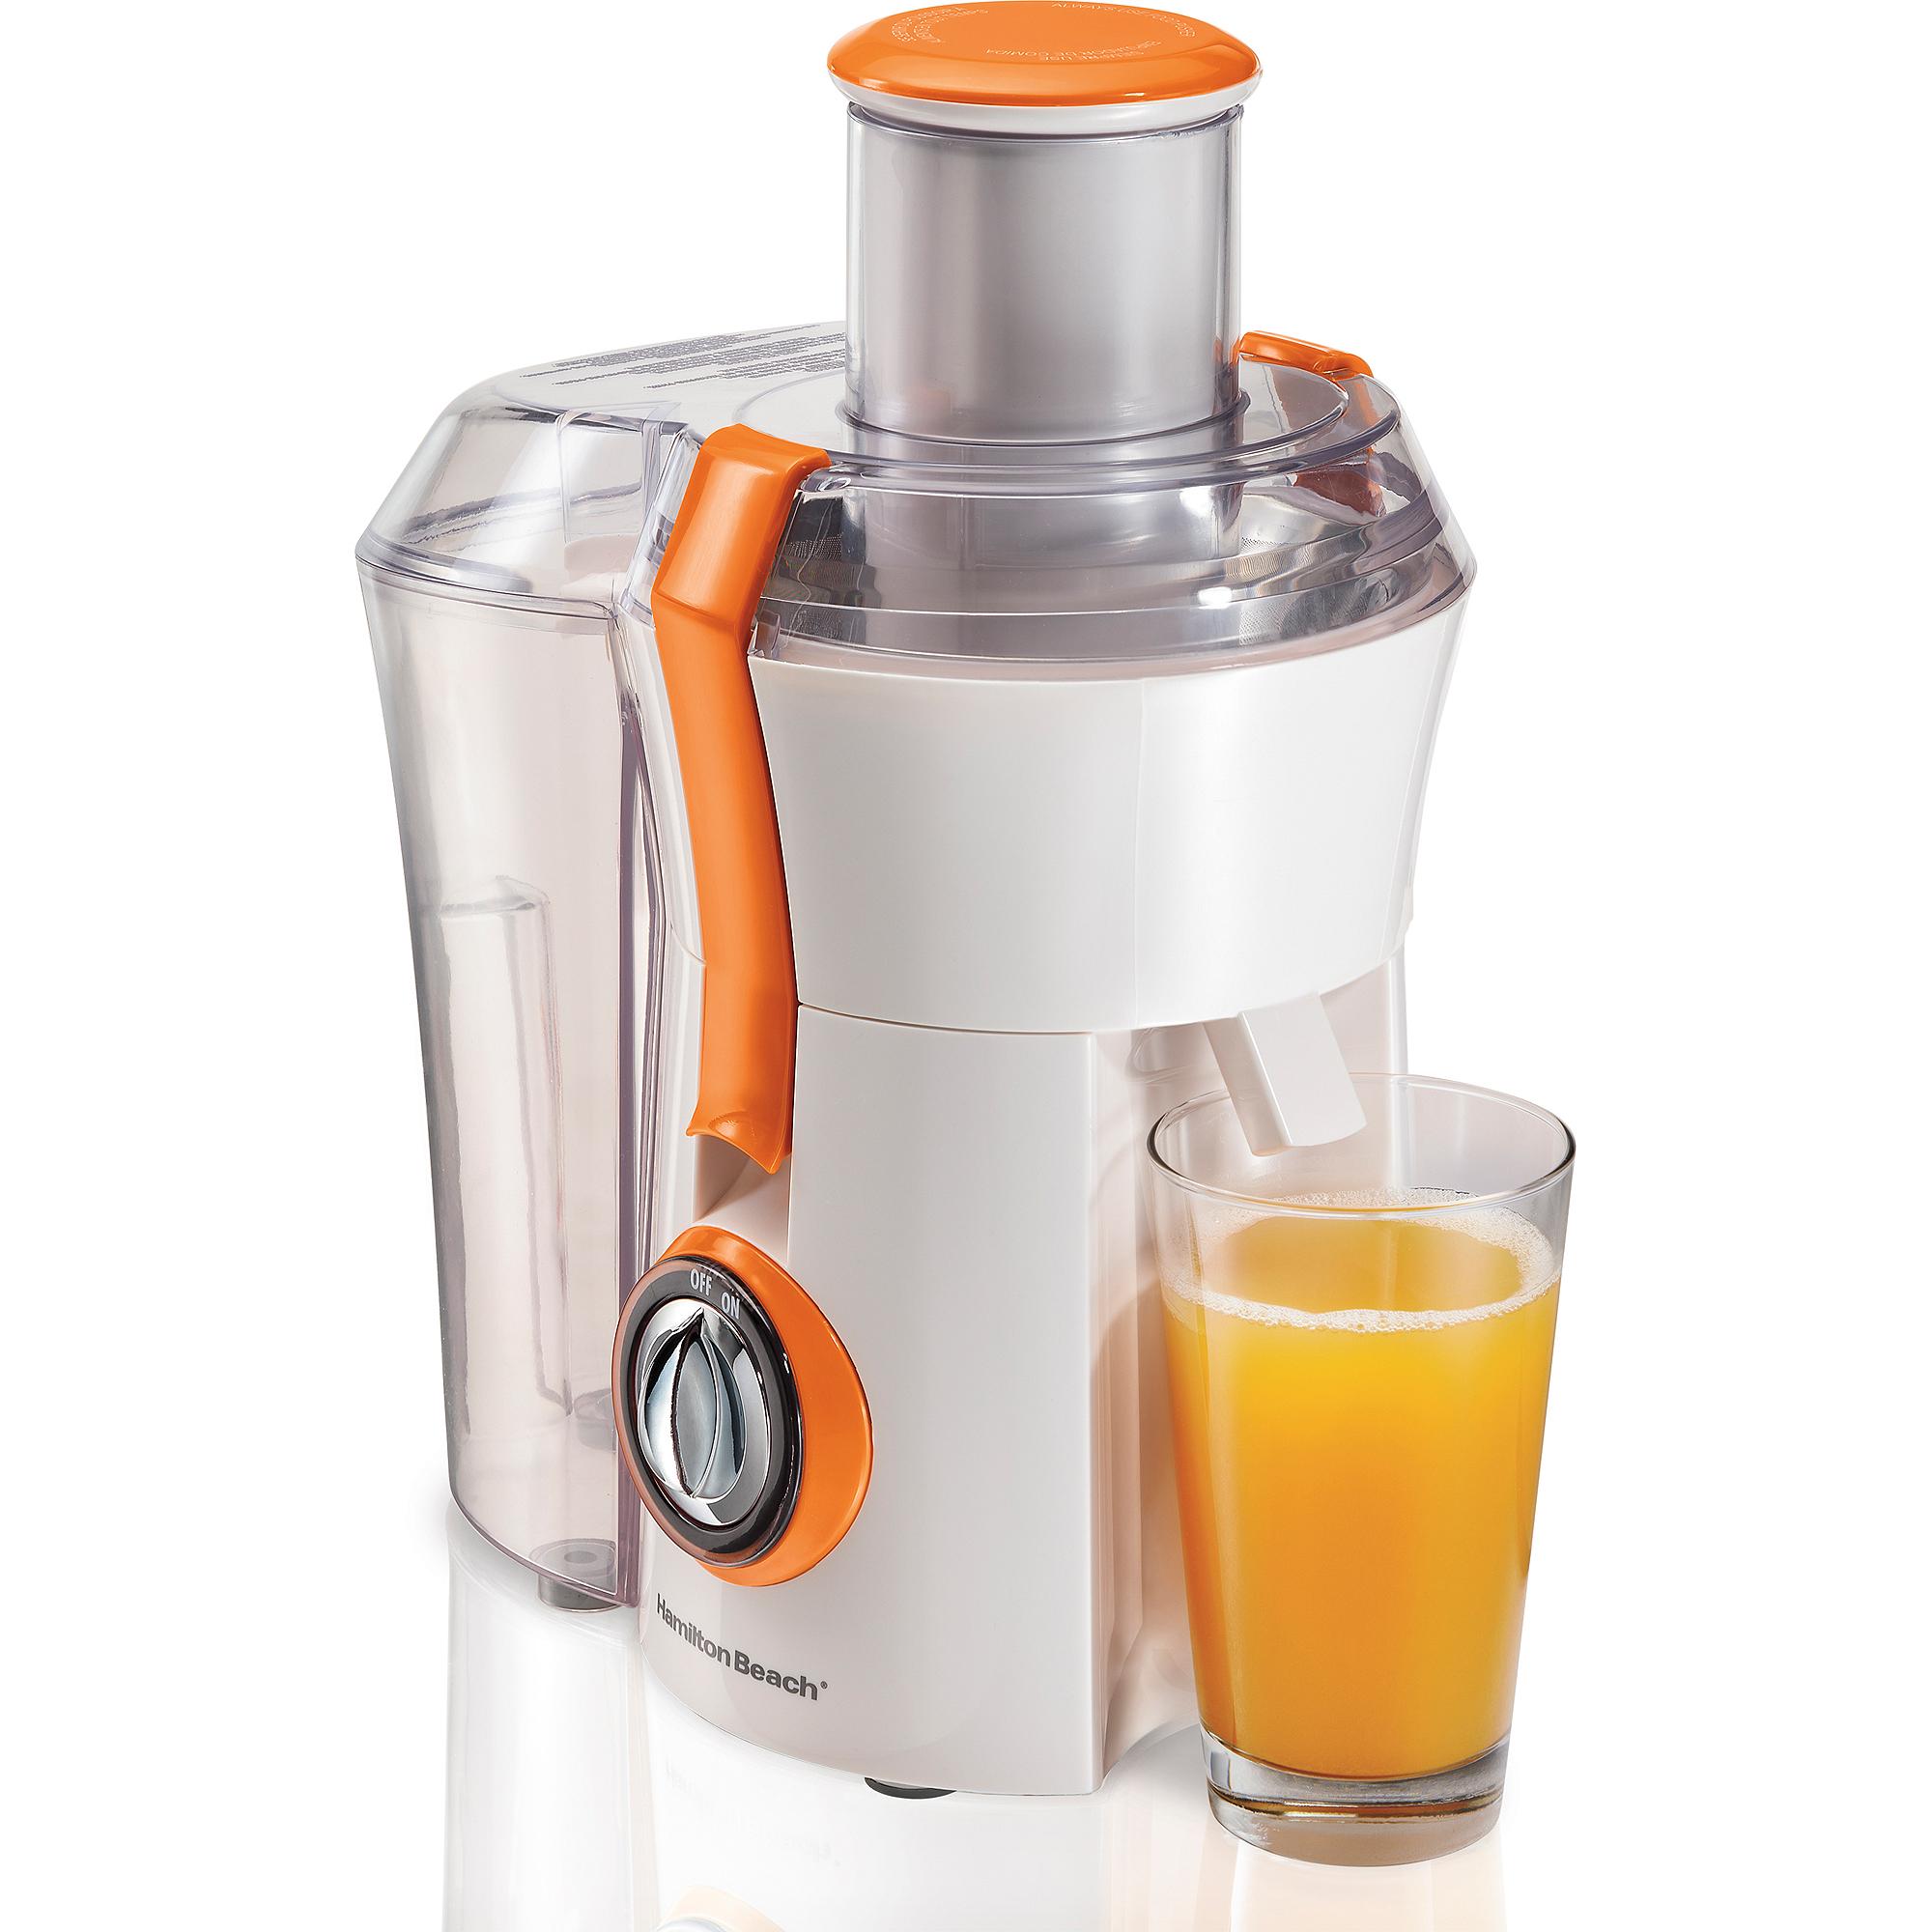 Hamilton Beach Big Mouth Juice Extractor   Model# 67603